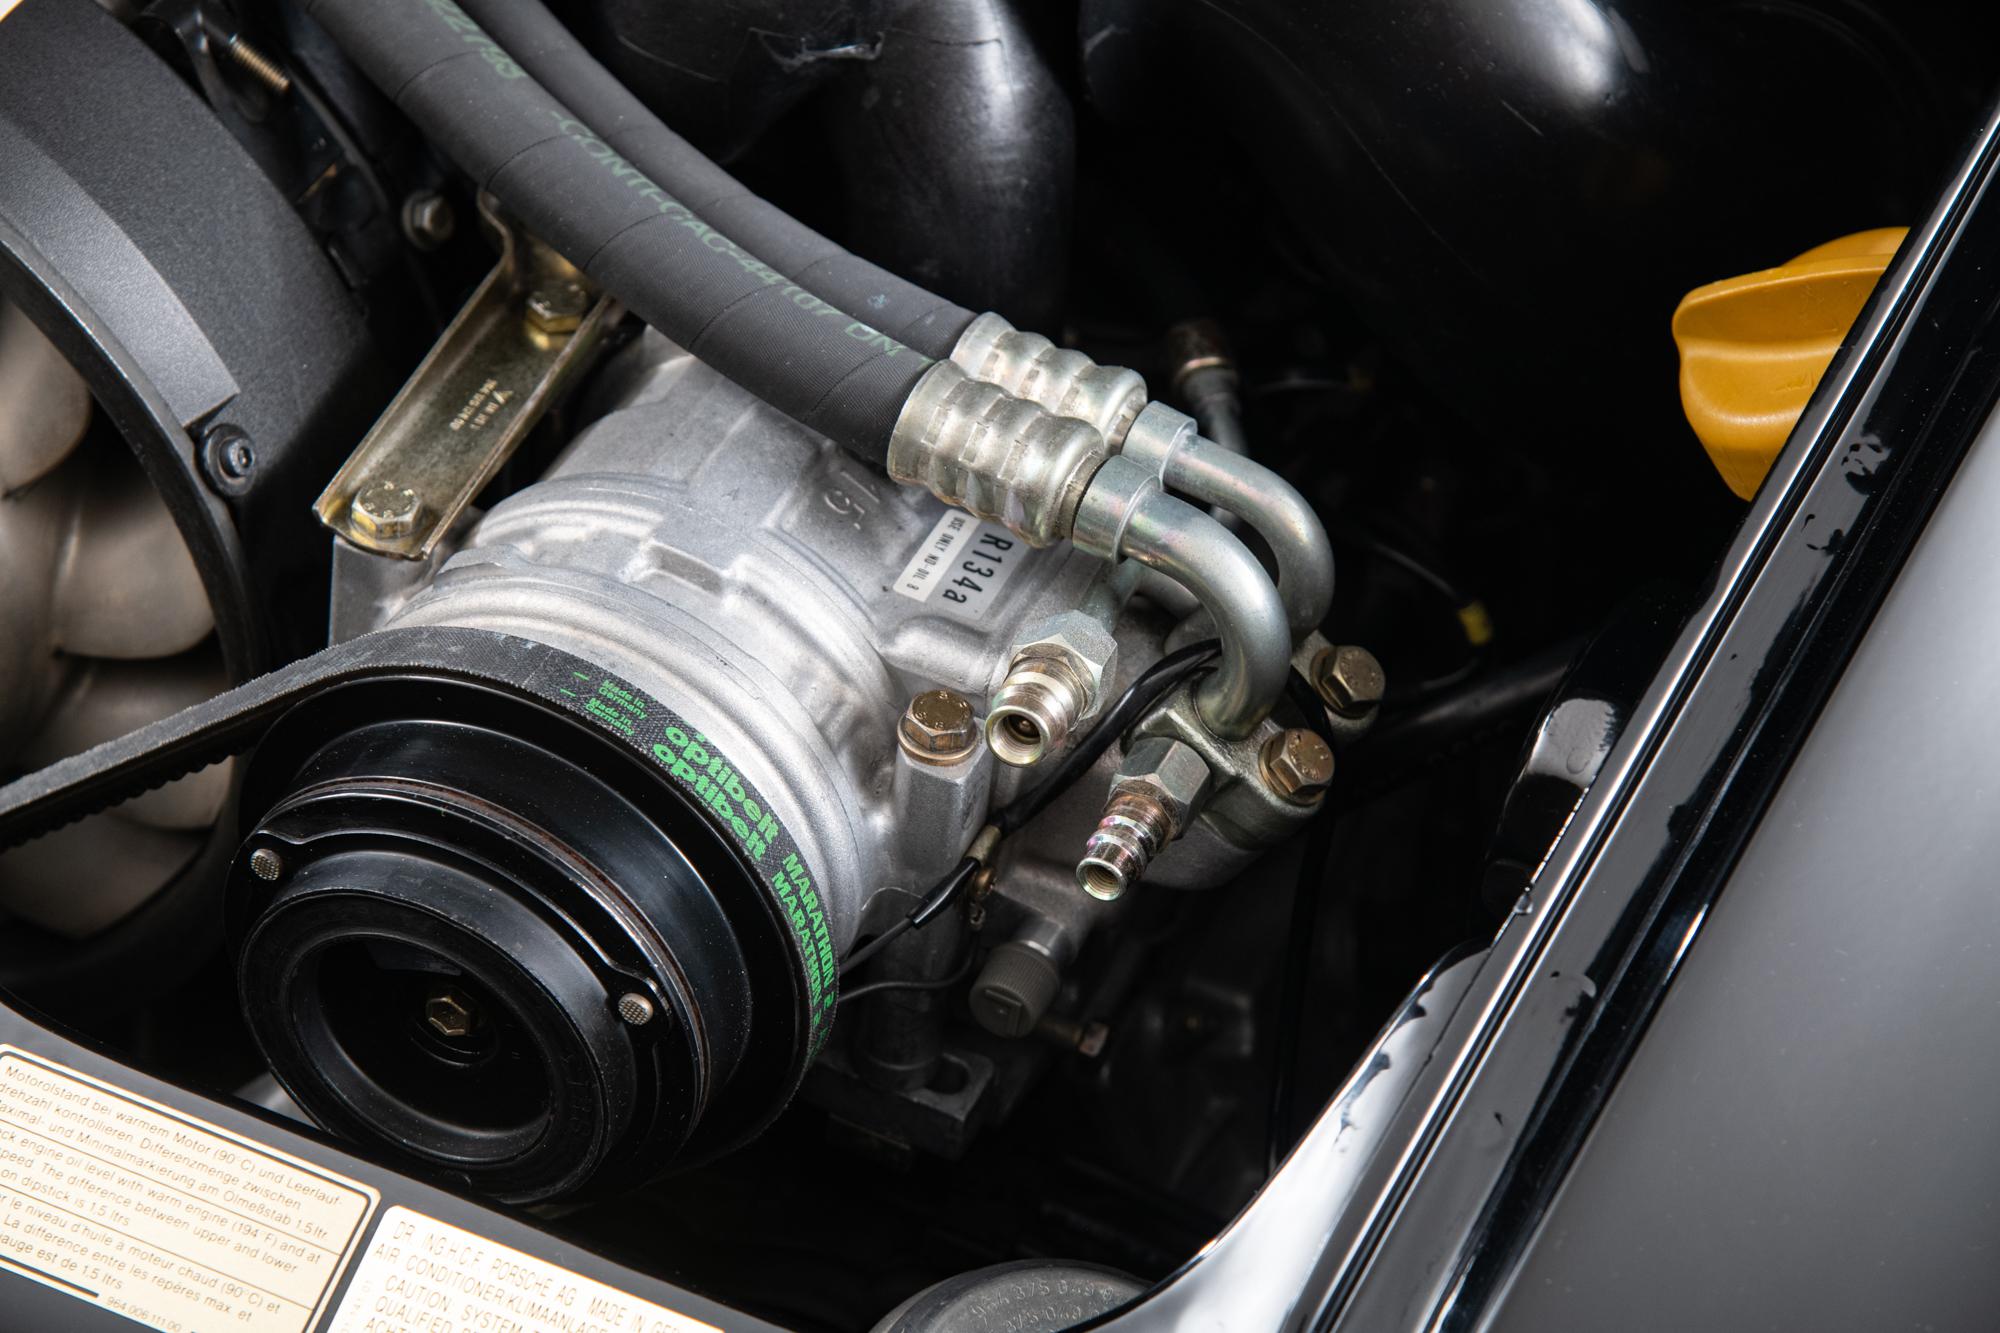 1994 Porsche 964 RS America , BLACK, VIN WP0AB2961RS419090, MILEAGE 65375